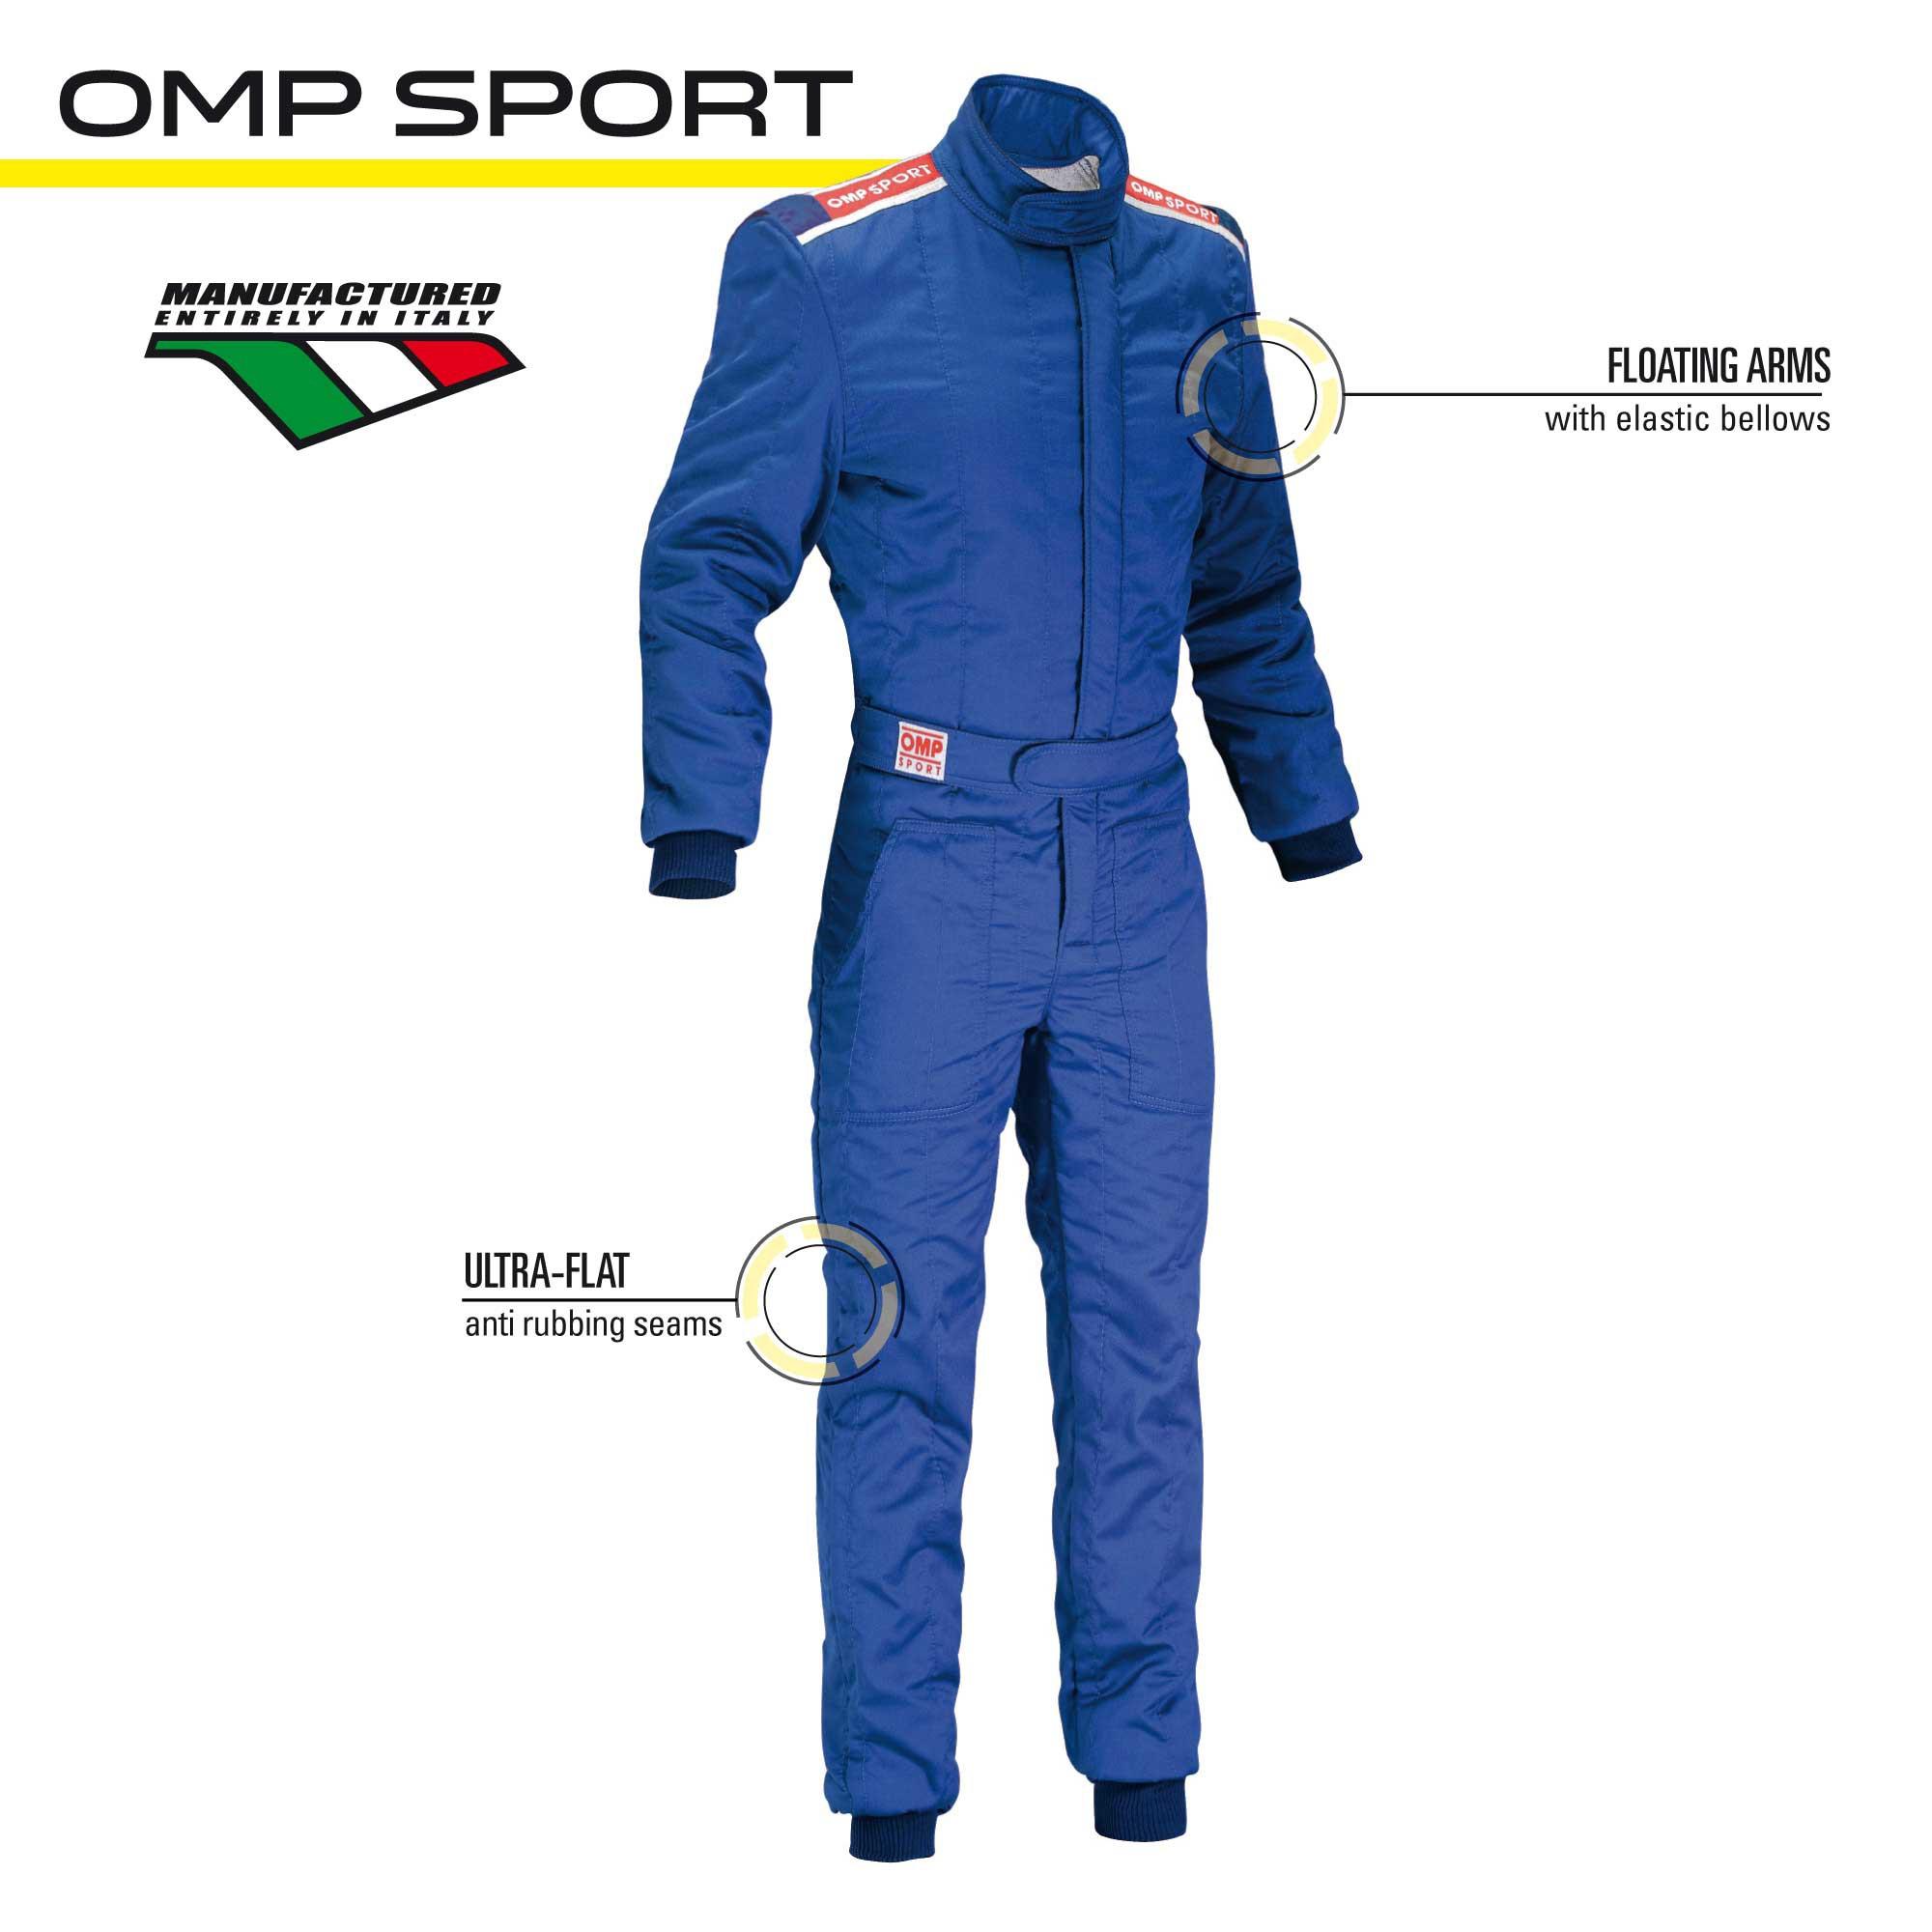 Entry level racing suits - OMP SPORT SUIT